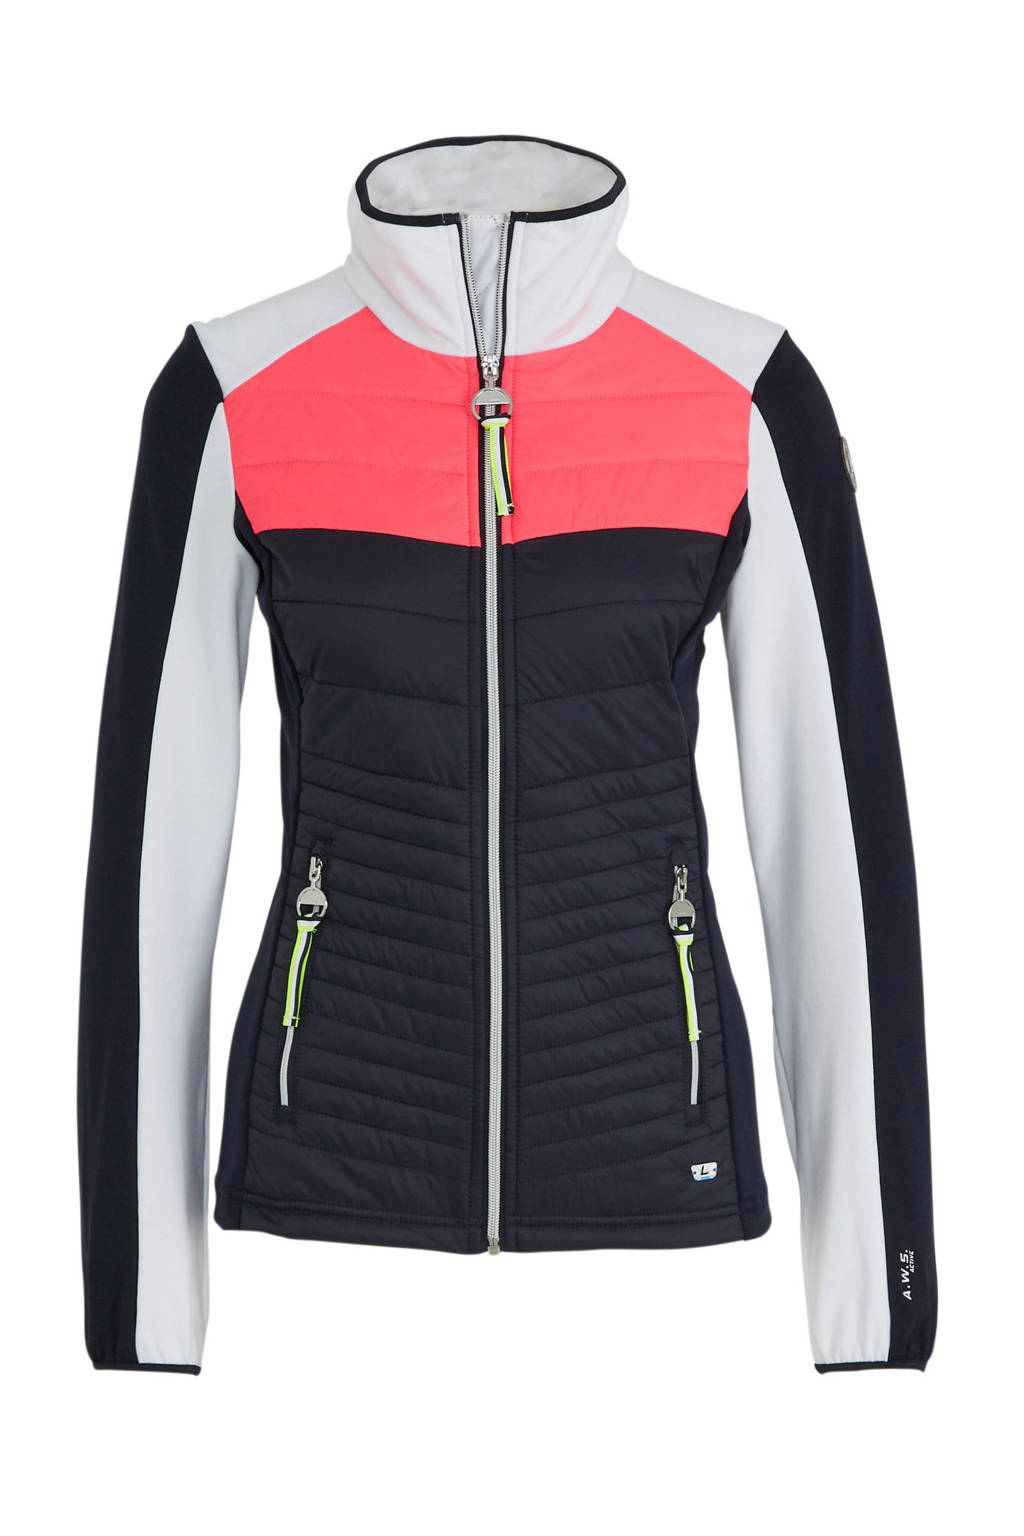 Luhta outdoor jack Annila donkerblauw/roze/wit, Donkerblauw/roze/wit